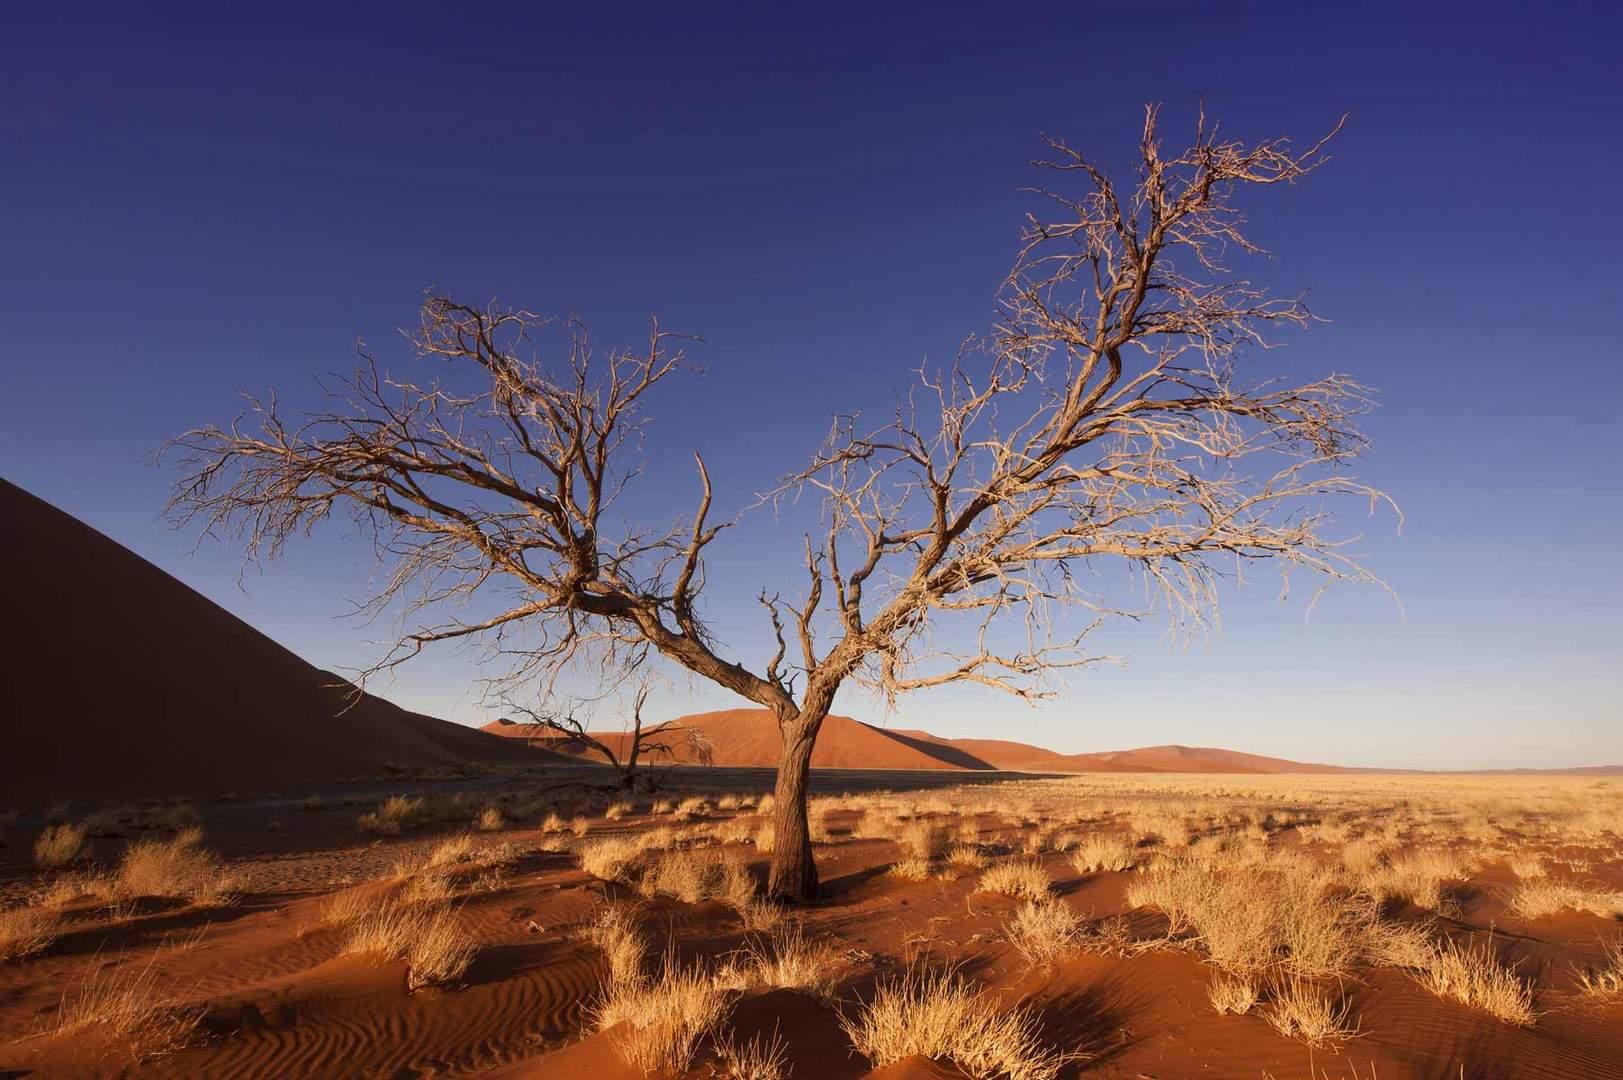 Afrika - die Sossusvlei Dünen